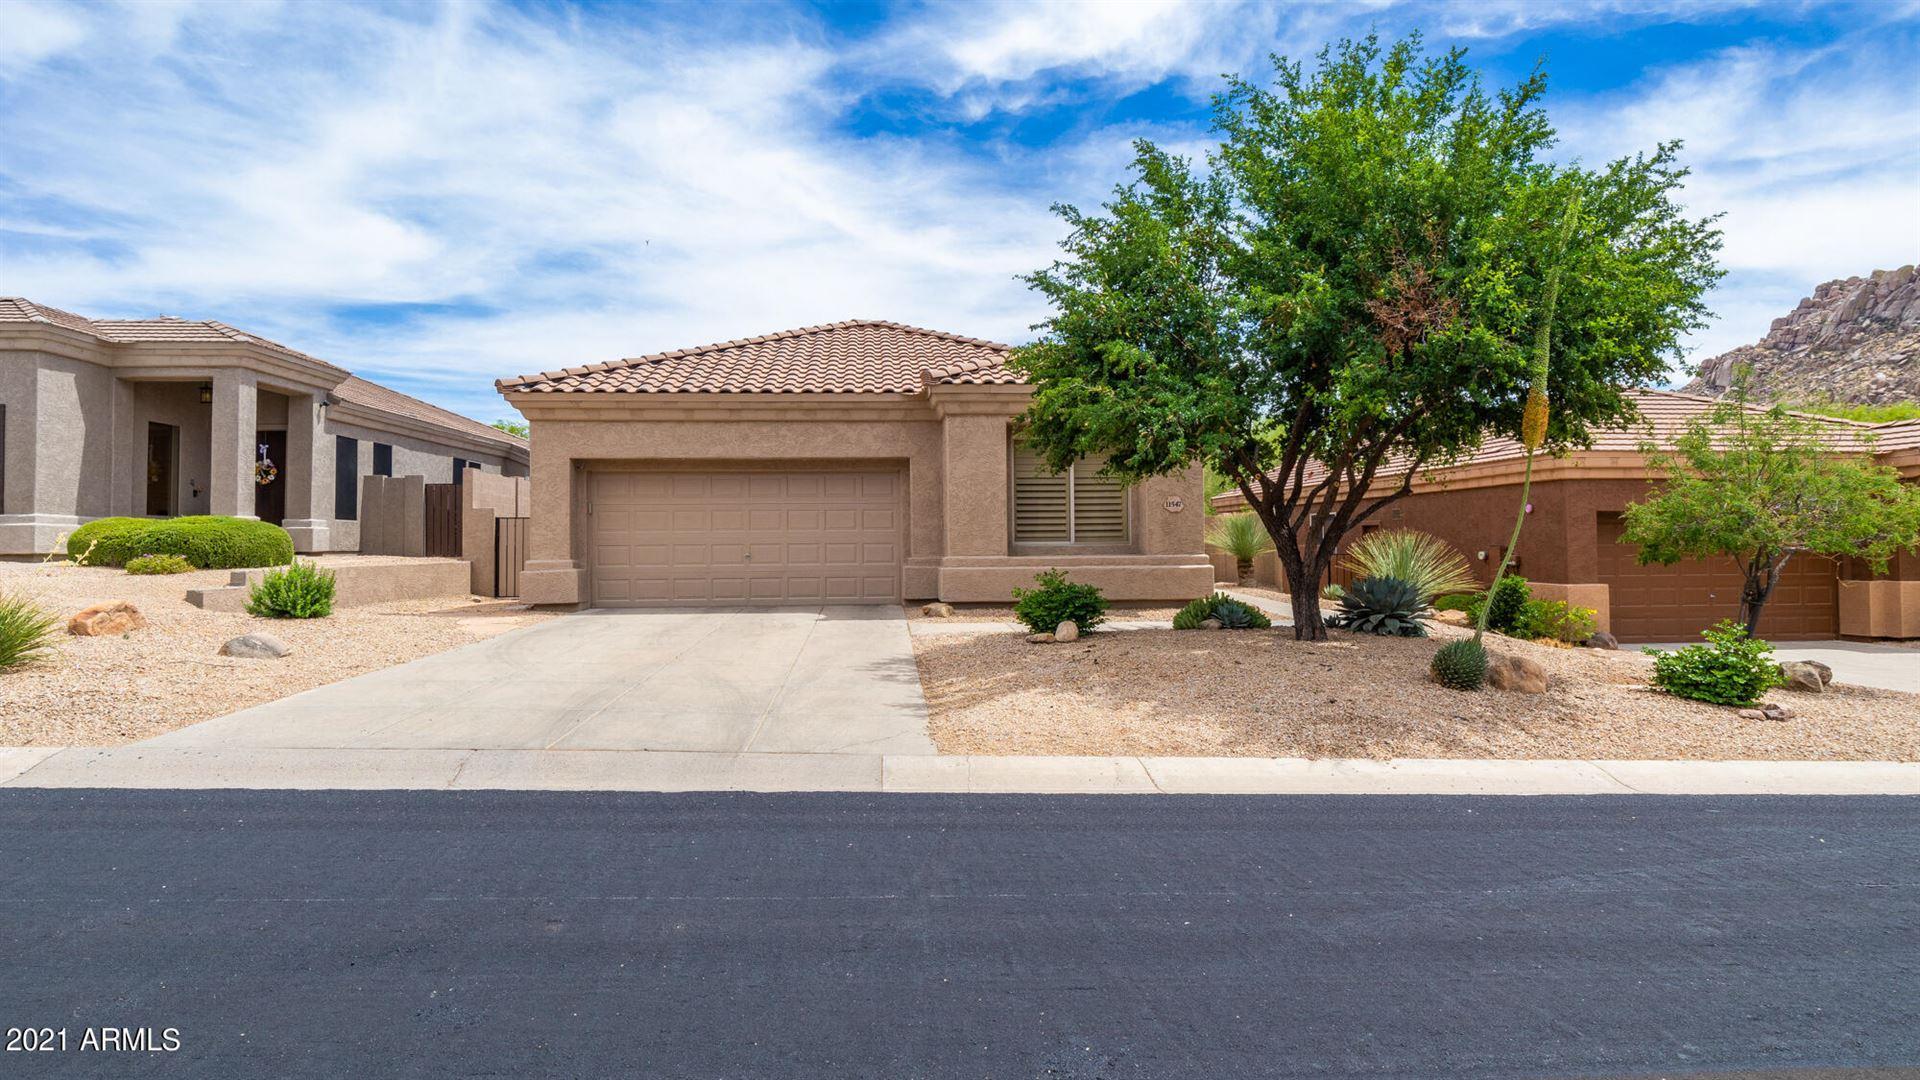 11547 E CHRISTMAS CHOLLA Drive, Scottsdale, AZ 85255 - MLS#: 6248847